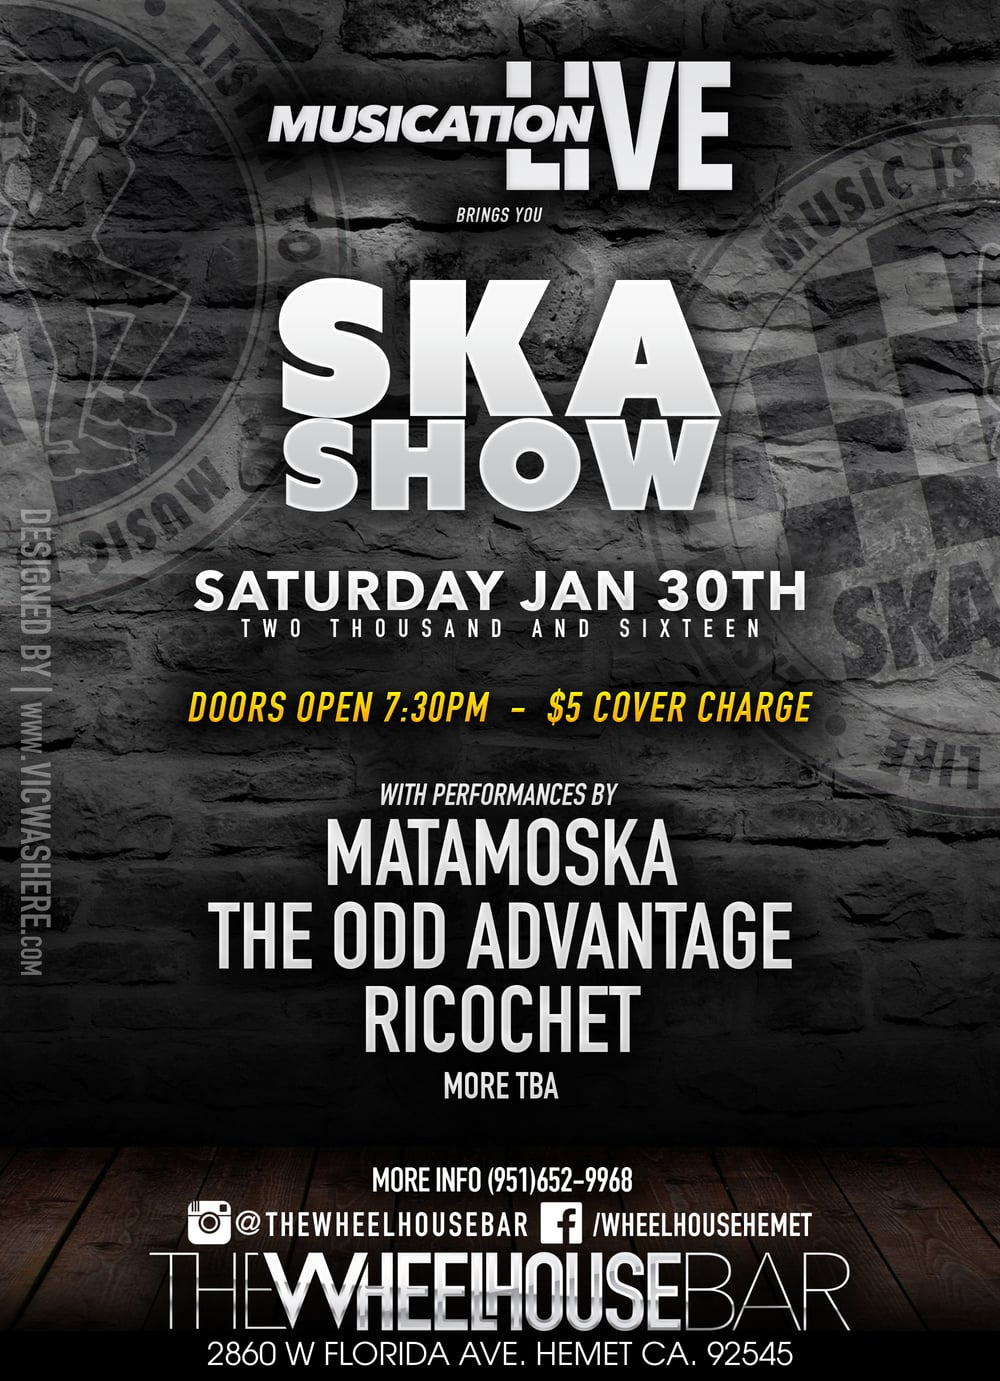 Ska Show by Musication Live at The Wheelhouse Bar in Hemet